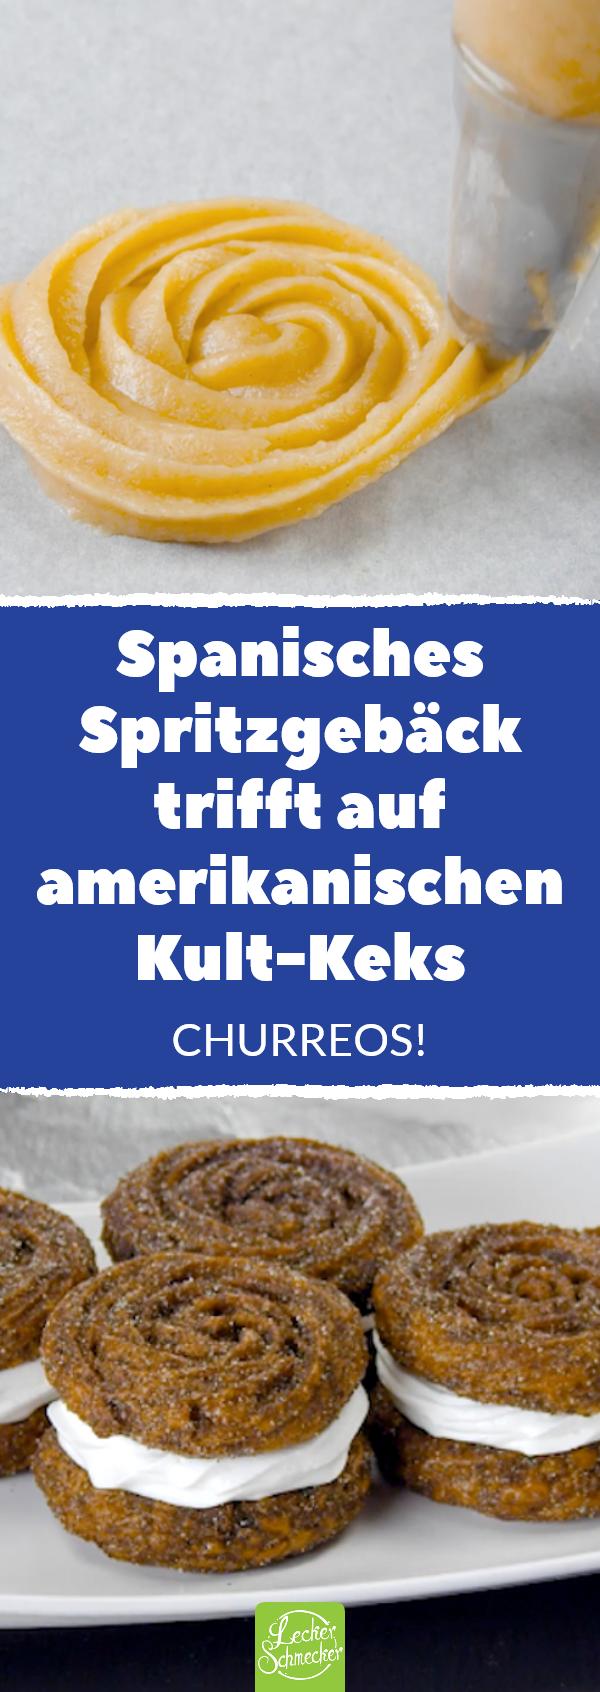 Oreo Churros | Churros selber machen mit Oreos